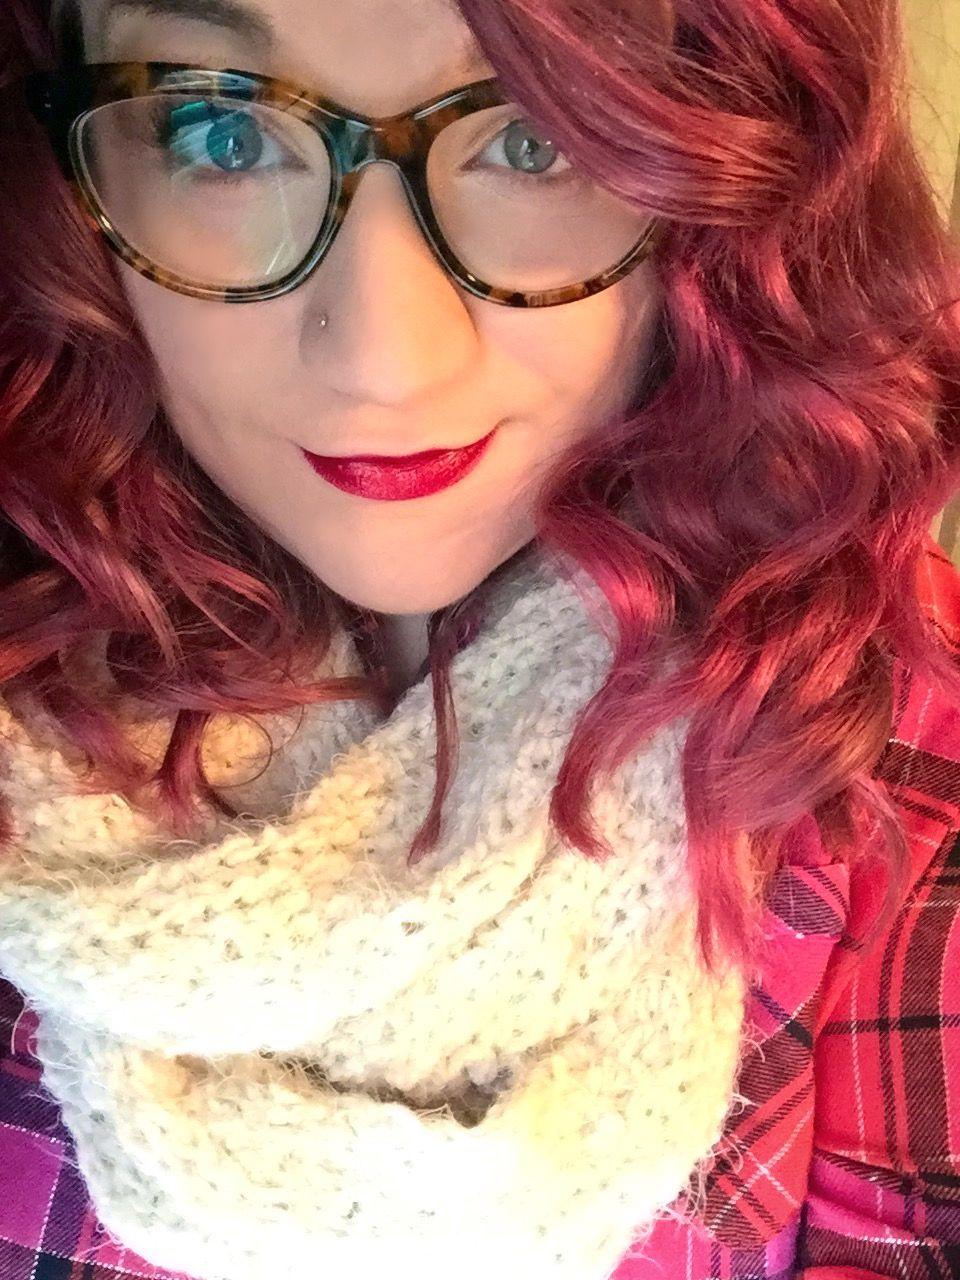 Splat Hair Dye In Pink Fetish No Bleach Over Blonde My Kind Of